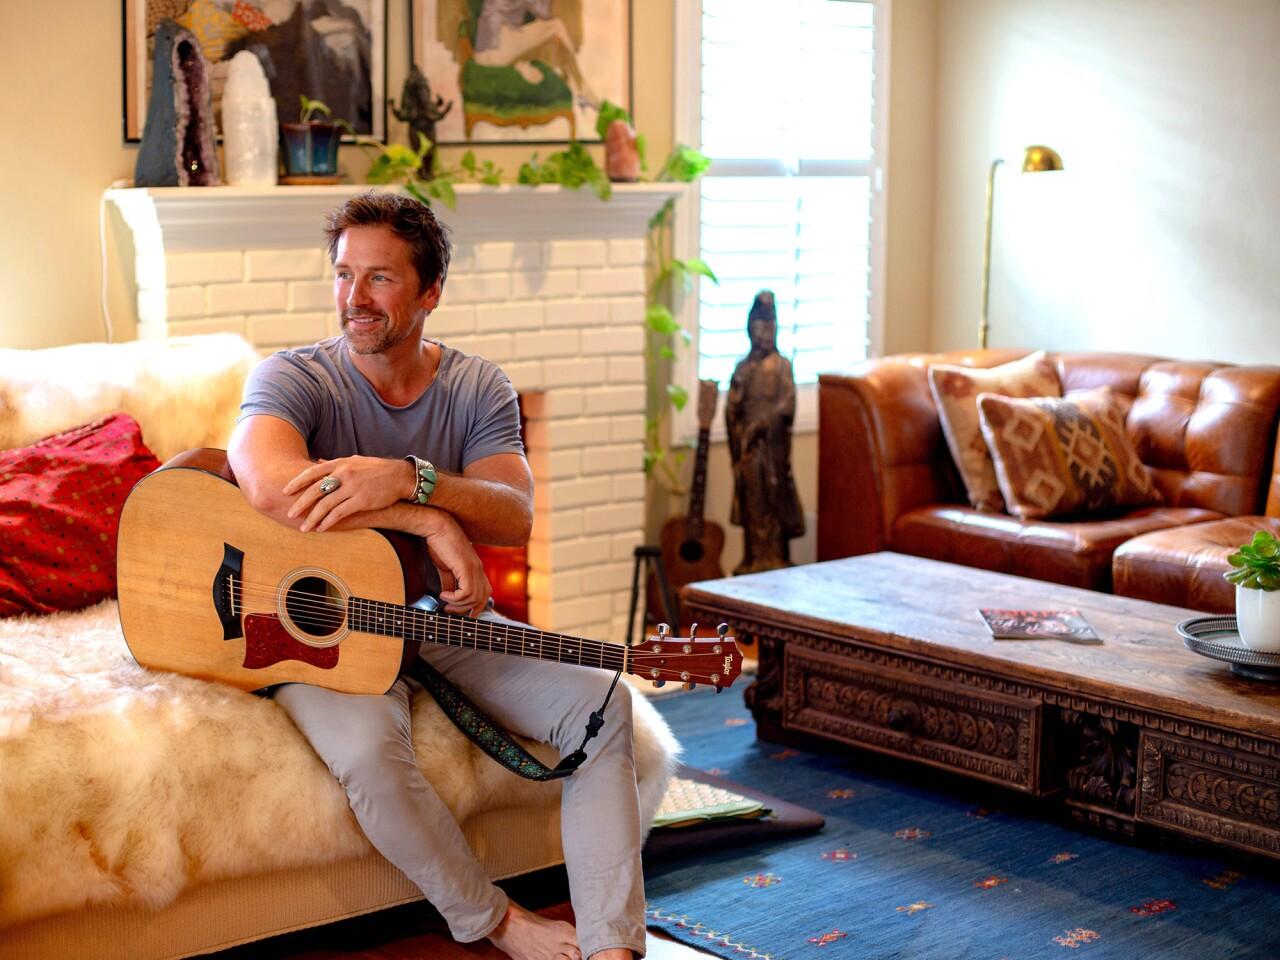 My Favorite Room | Actor and musician Paul Greene